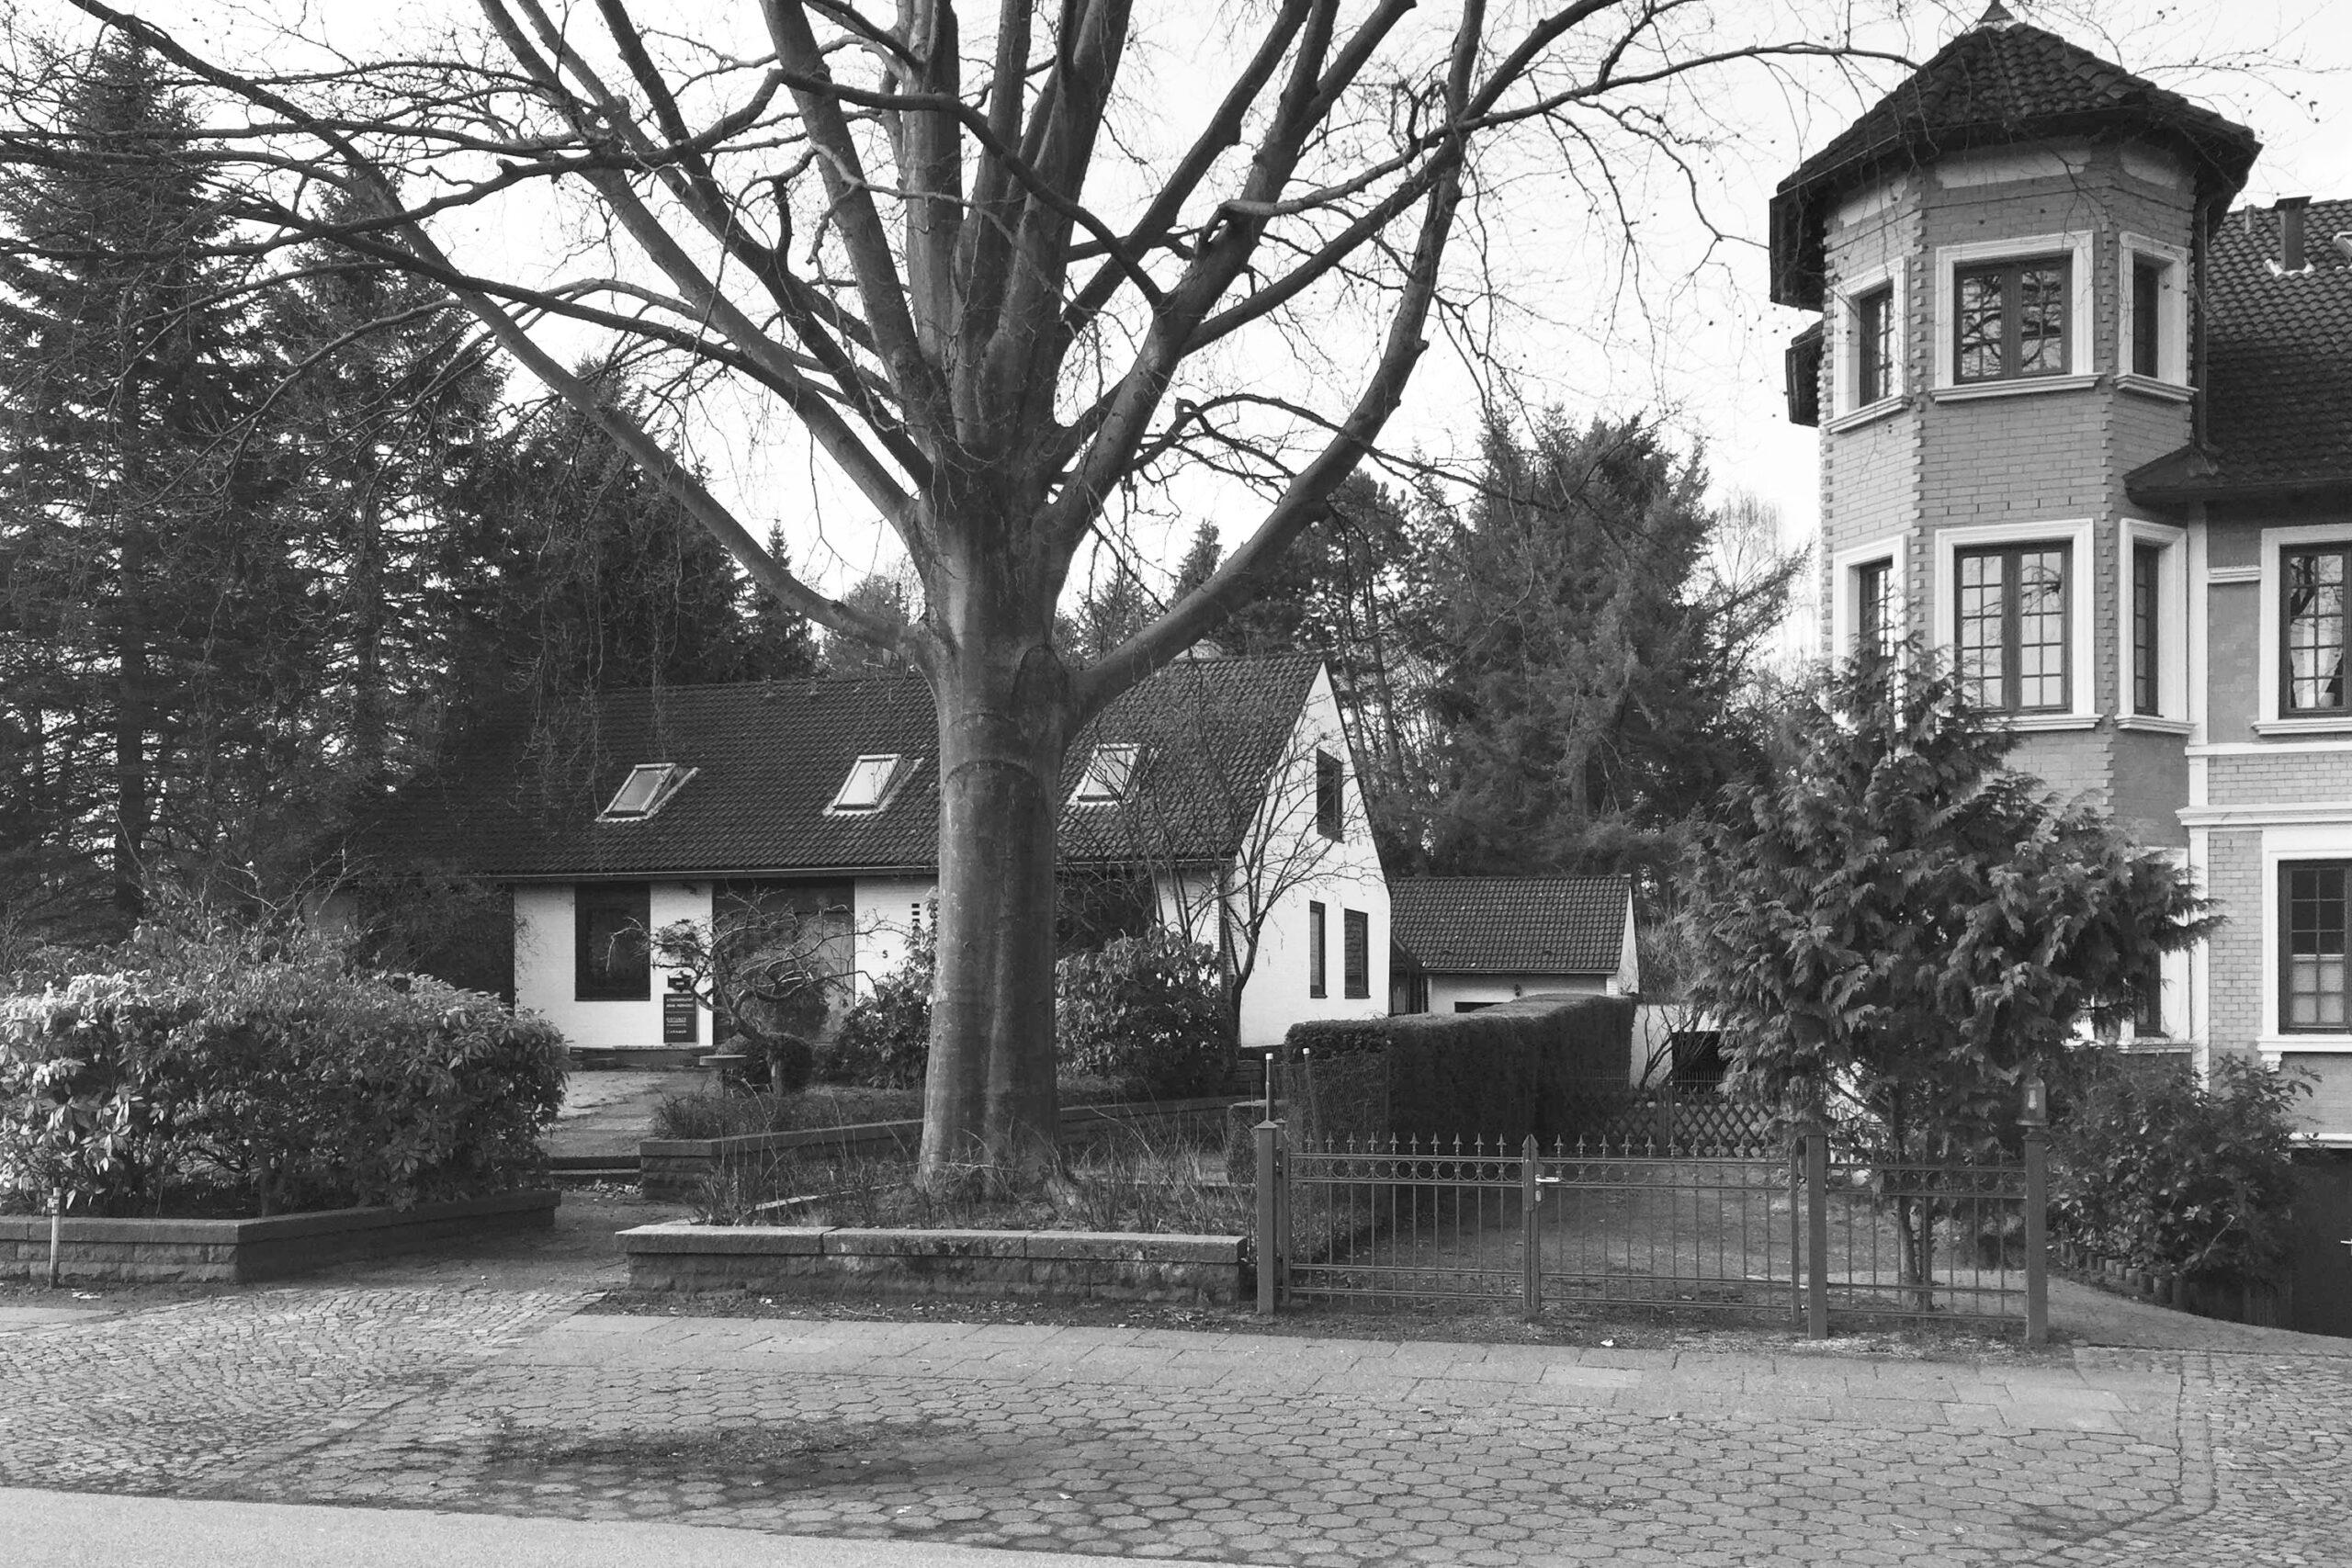 Brückwiesenstraße | Groß Borstel